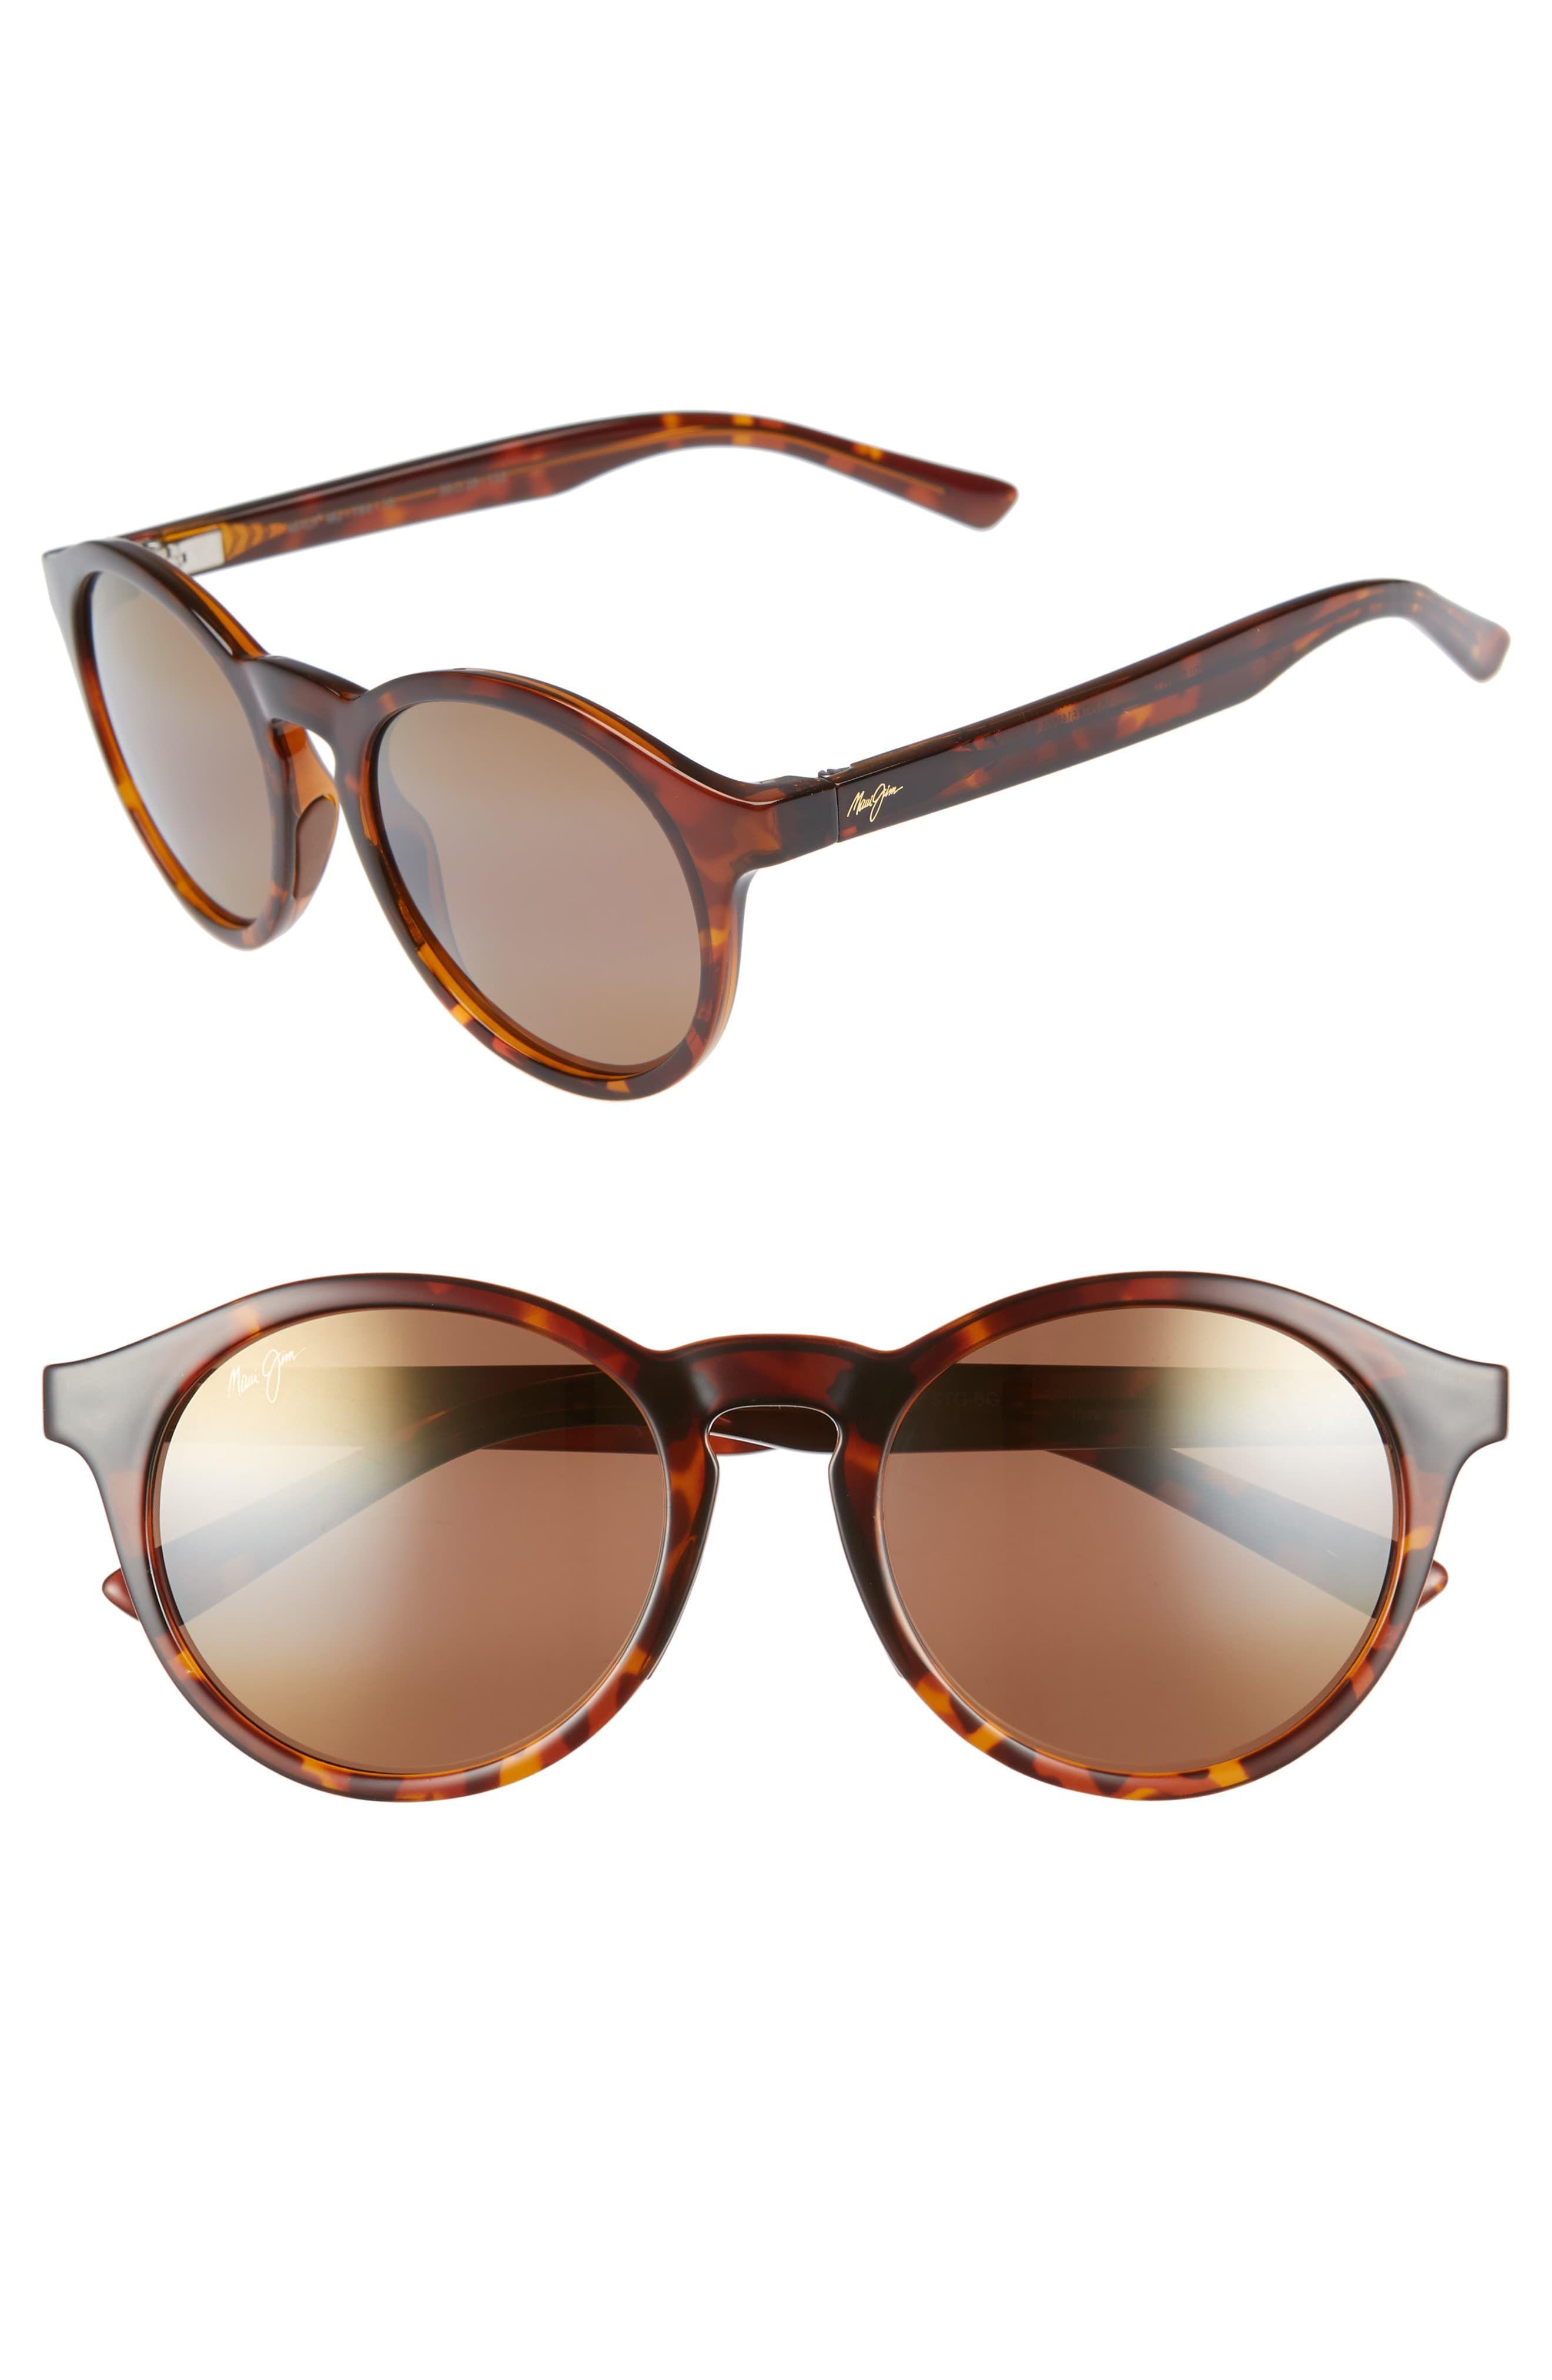 0326fbc6d0 Women's Maui Jim Pineapple 50Mm Polarized Round Sunglasses - Tortoise